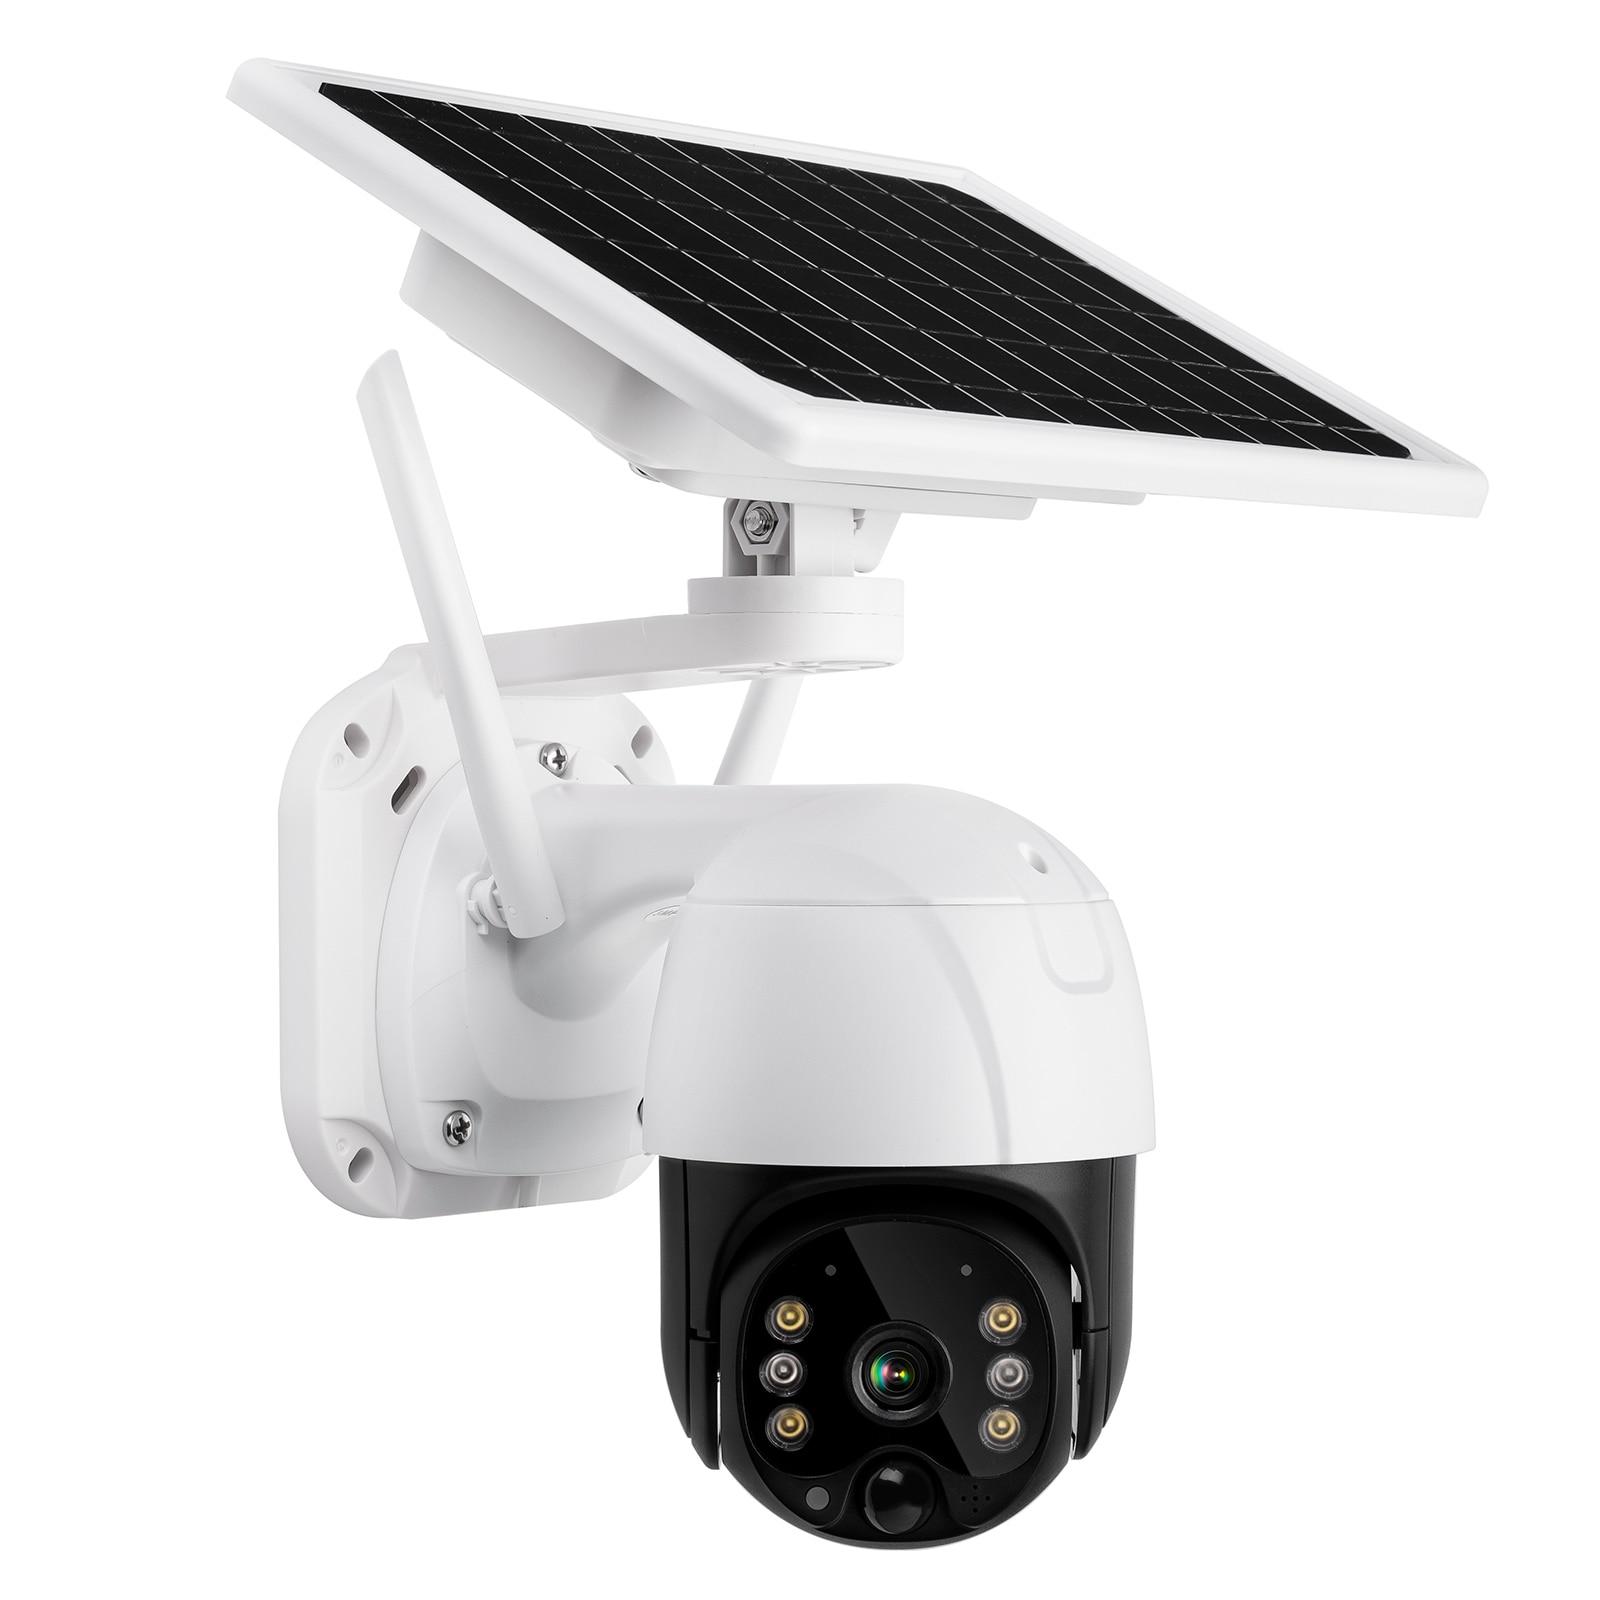 4G سيم بطاقة واي فاي IP كاميرا متحركة 8 واط لوحة طاقة شمسية بطارية قابلة للشحن كشف الحركة PIR إنذار النجوم الرئيسية P2P كاميرا الأمن